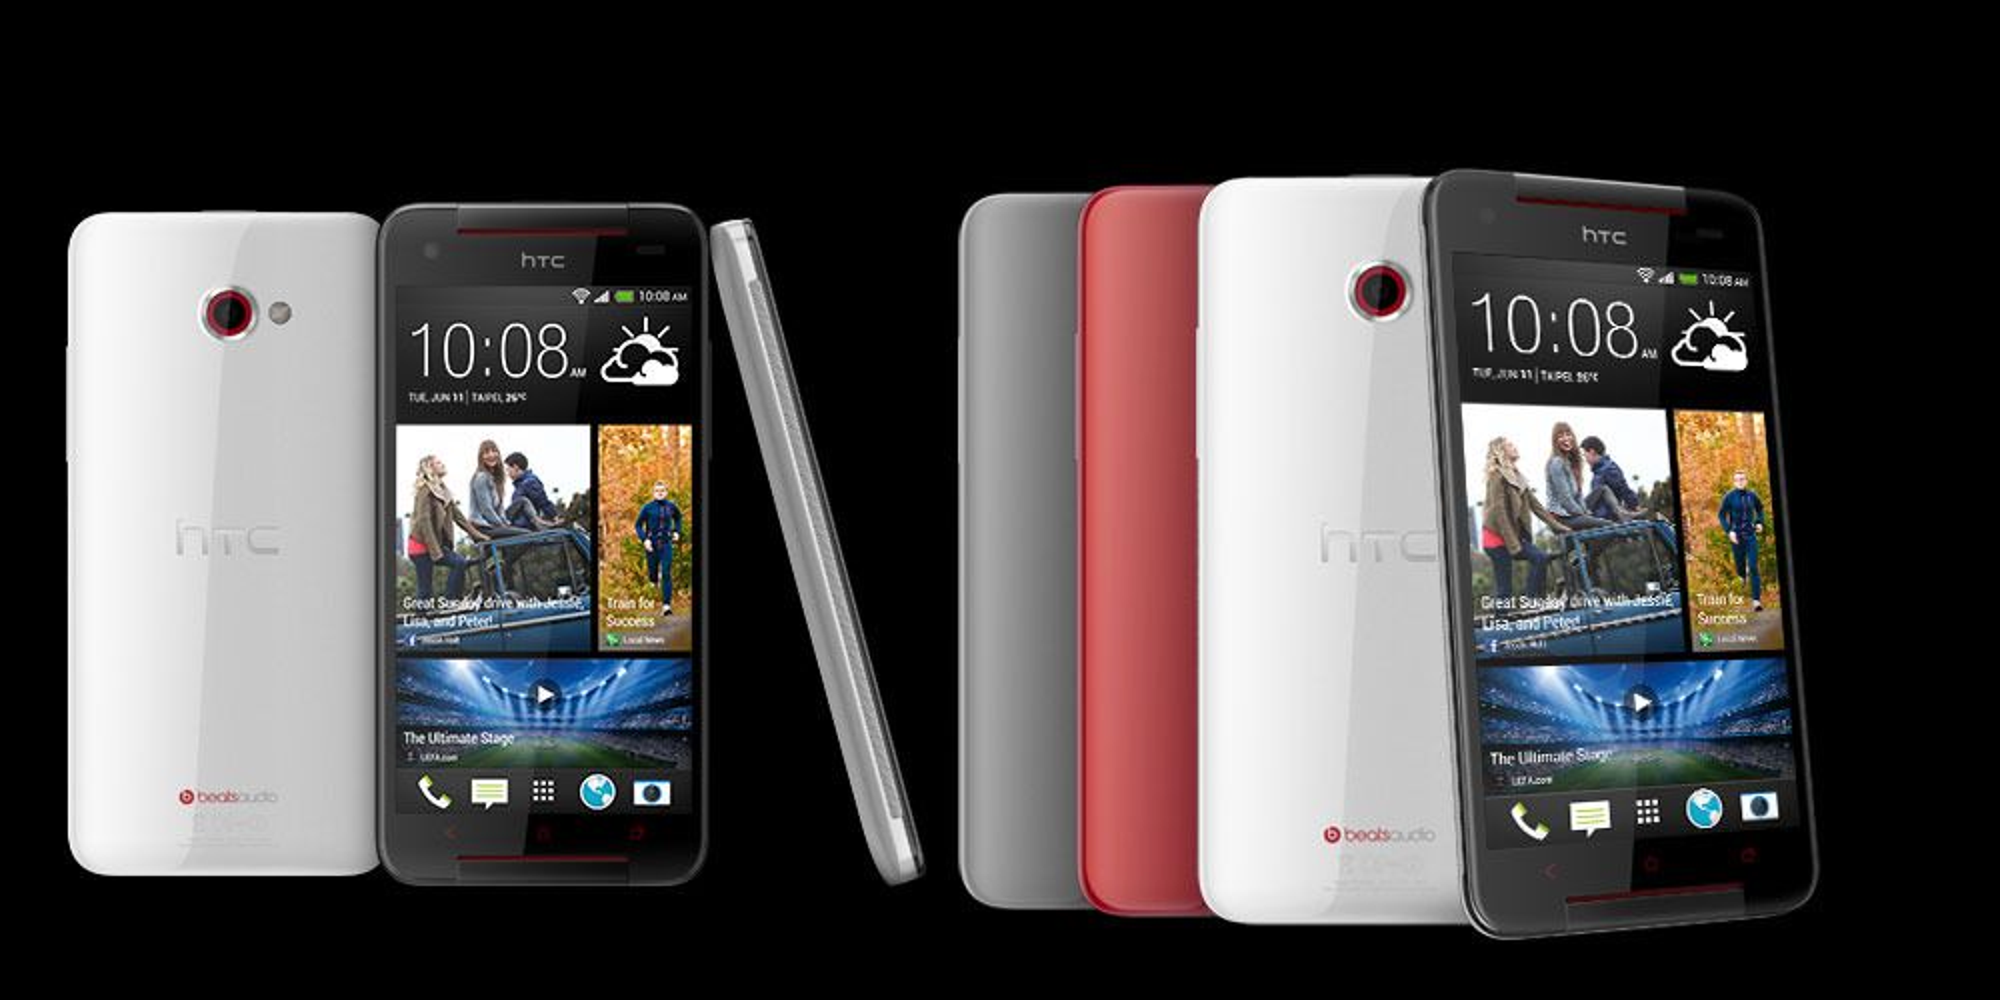 HTC lanserer Butterfly S